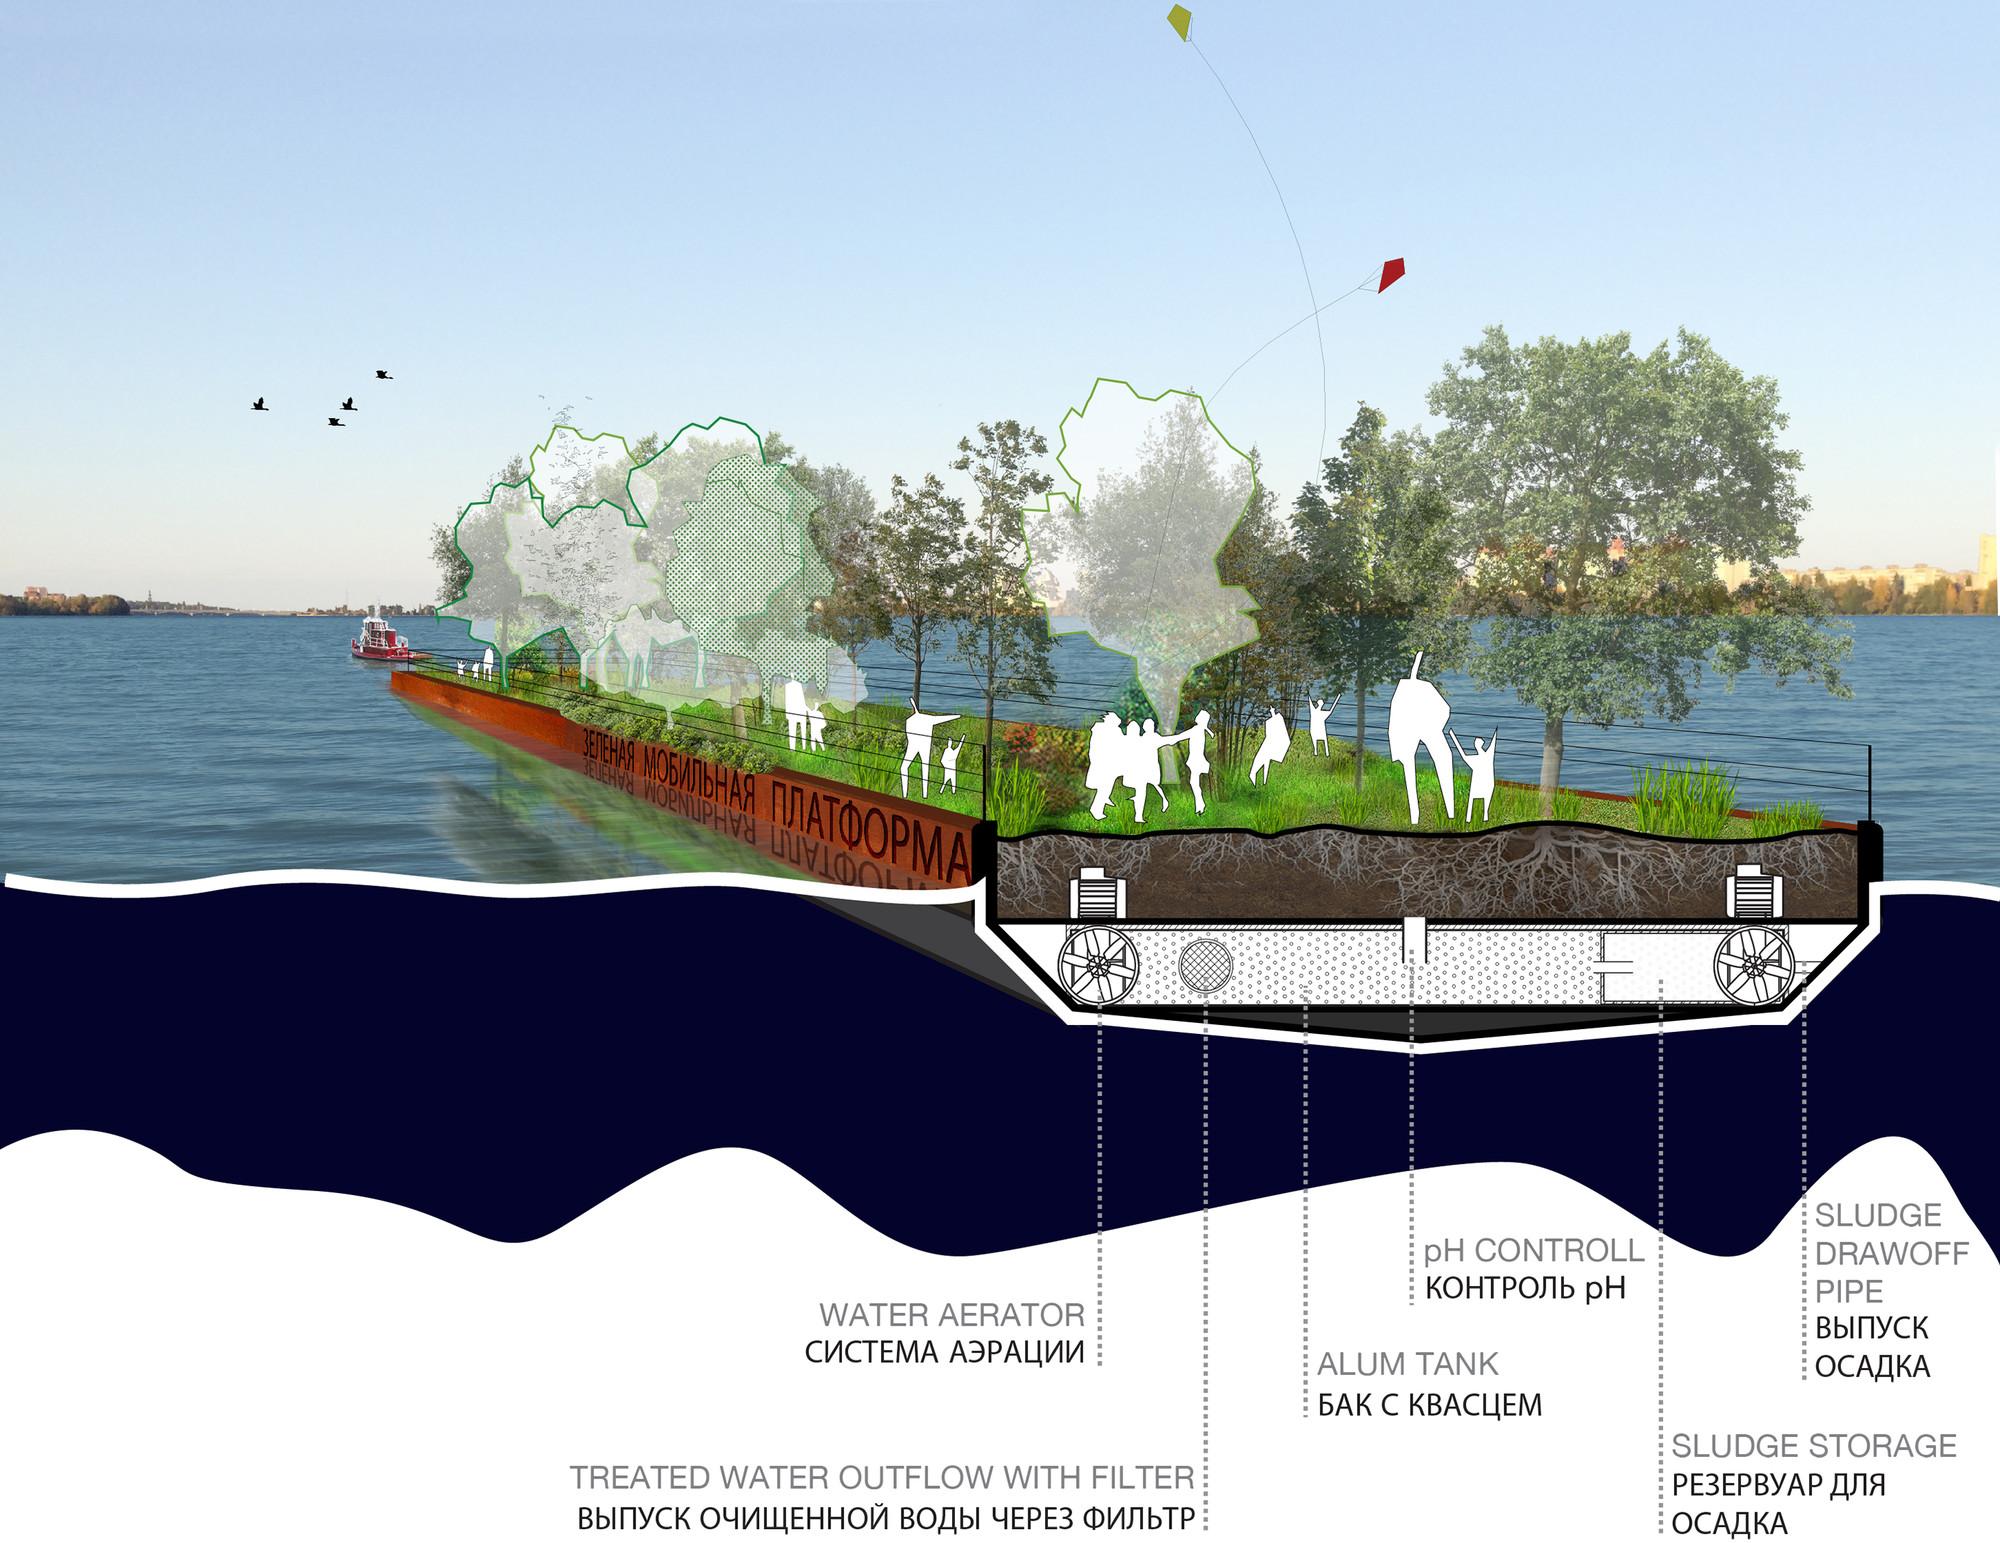 Infraestructuras flotantes: paisaje flotante. Image Cortesia de Ecosistema Urbano